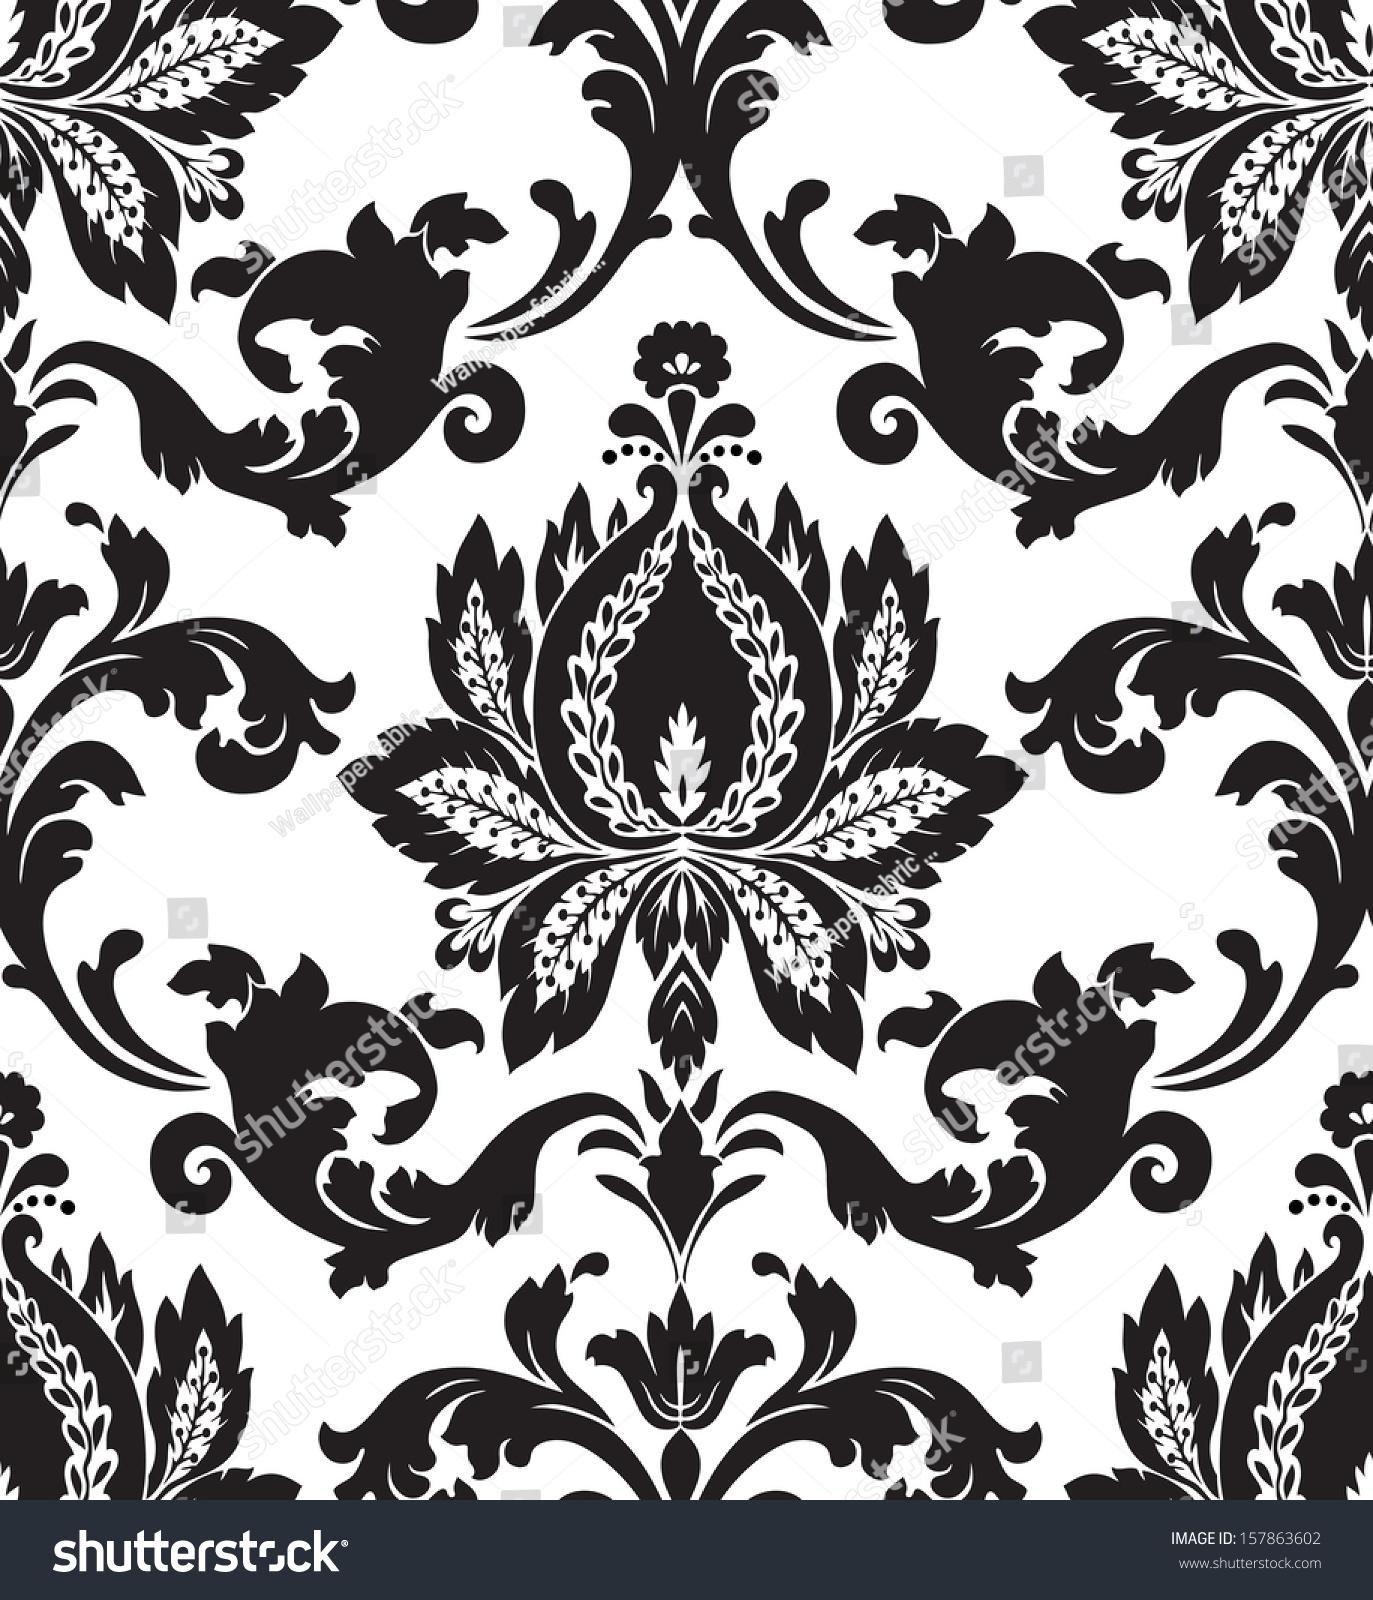 Simple Damask Patterns